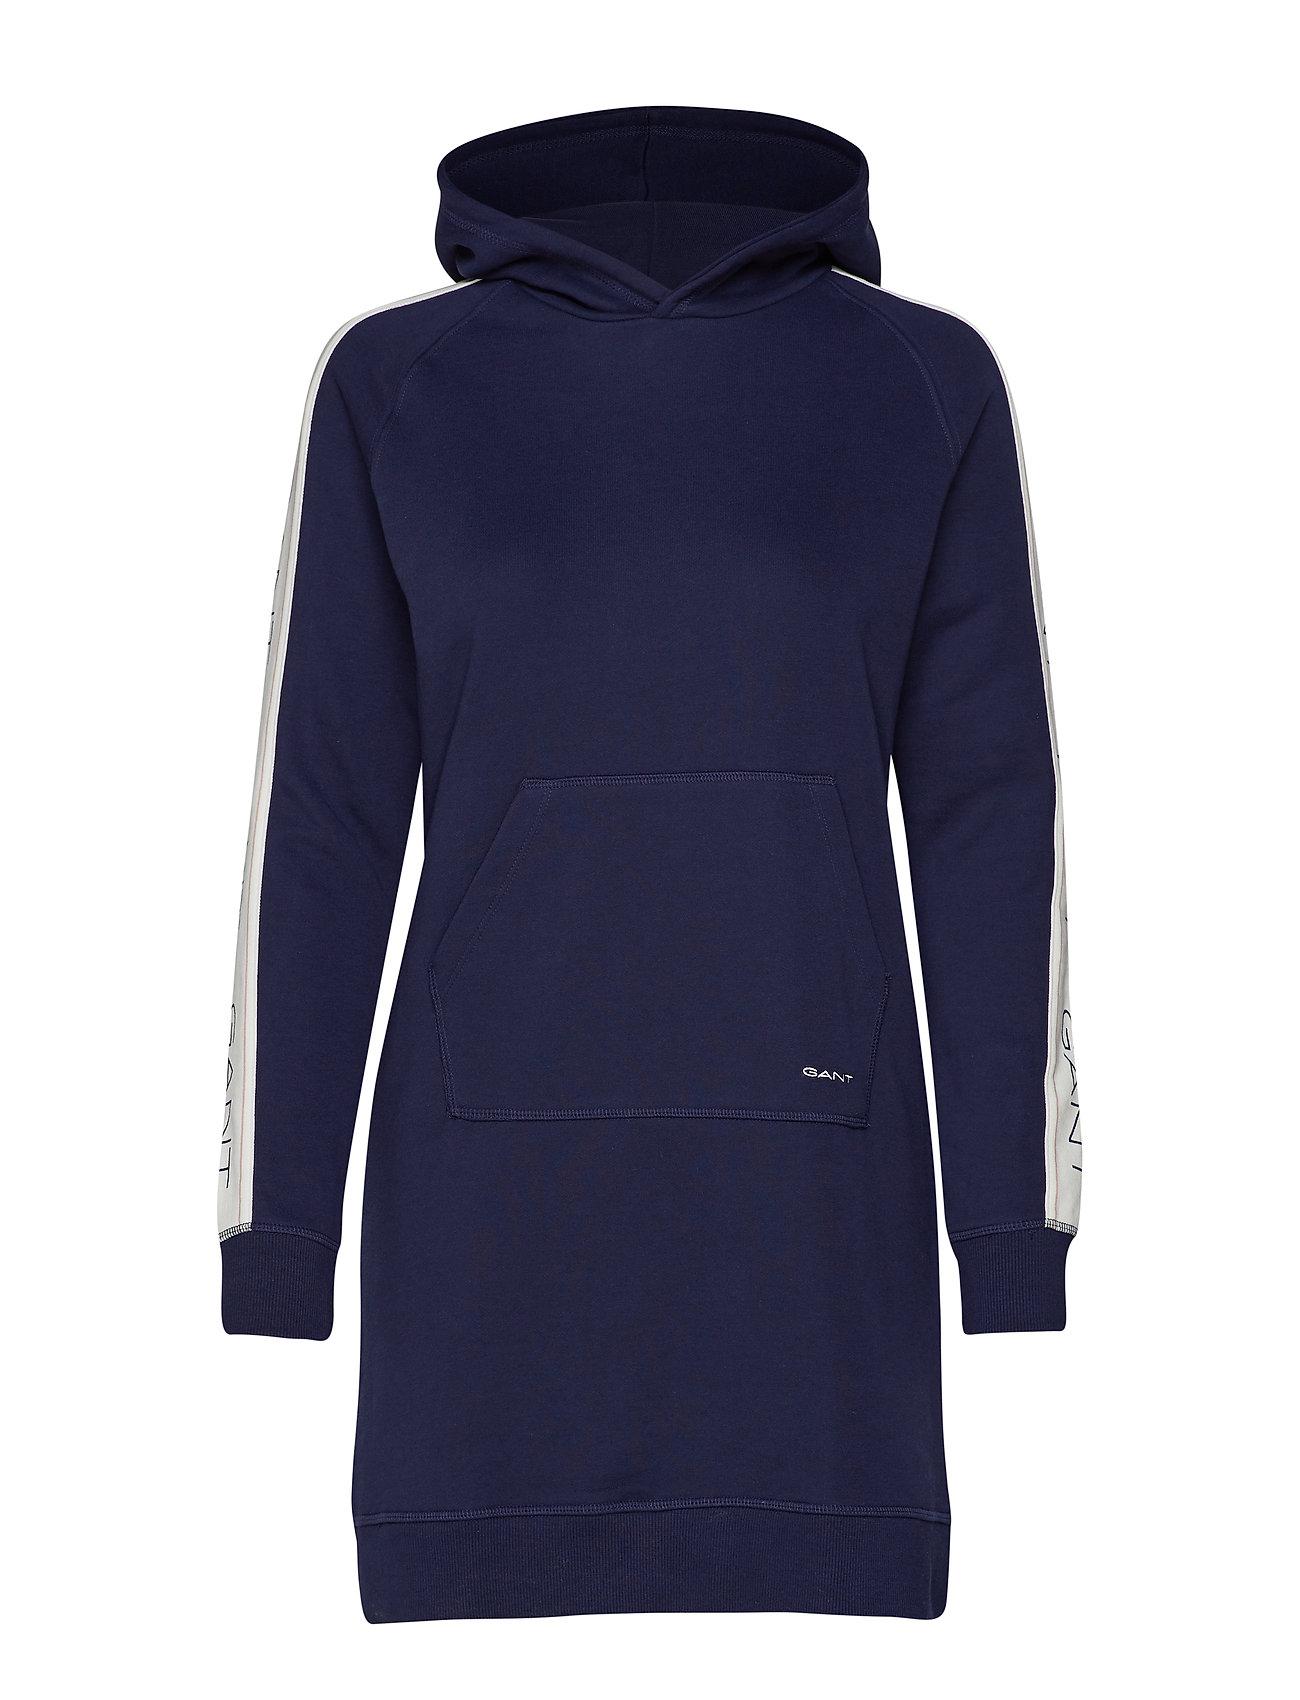 GANT D1.GANT ARCHIVE SWEAT HOODIE DRESS - EVENING BLUE